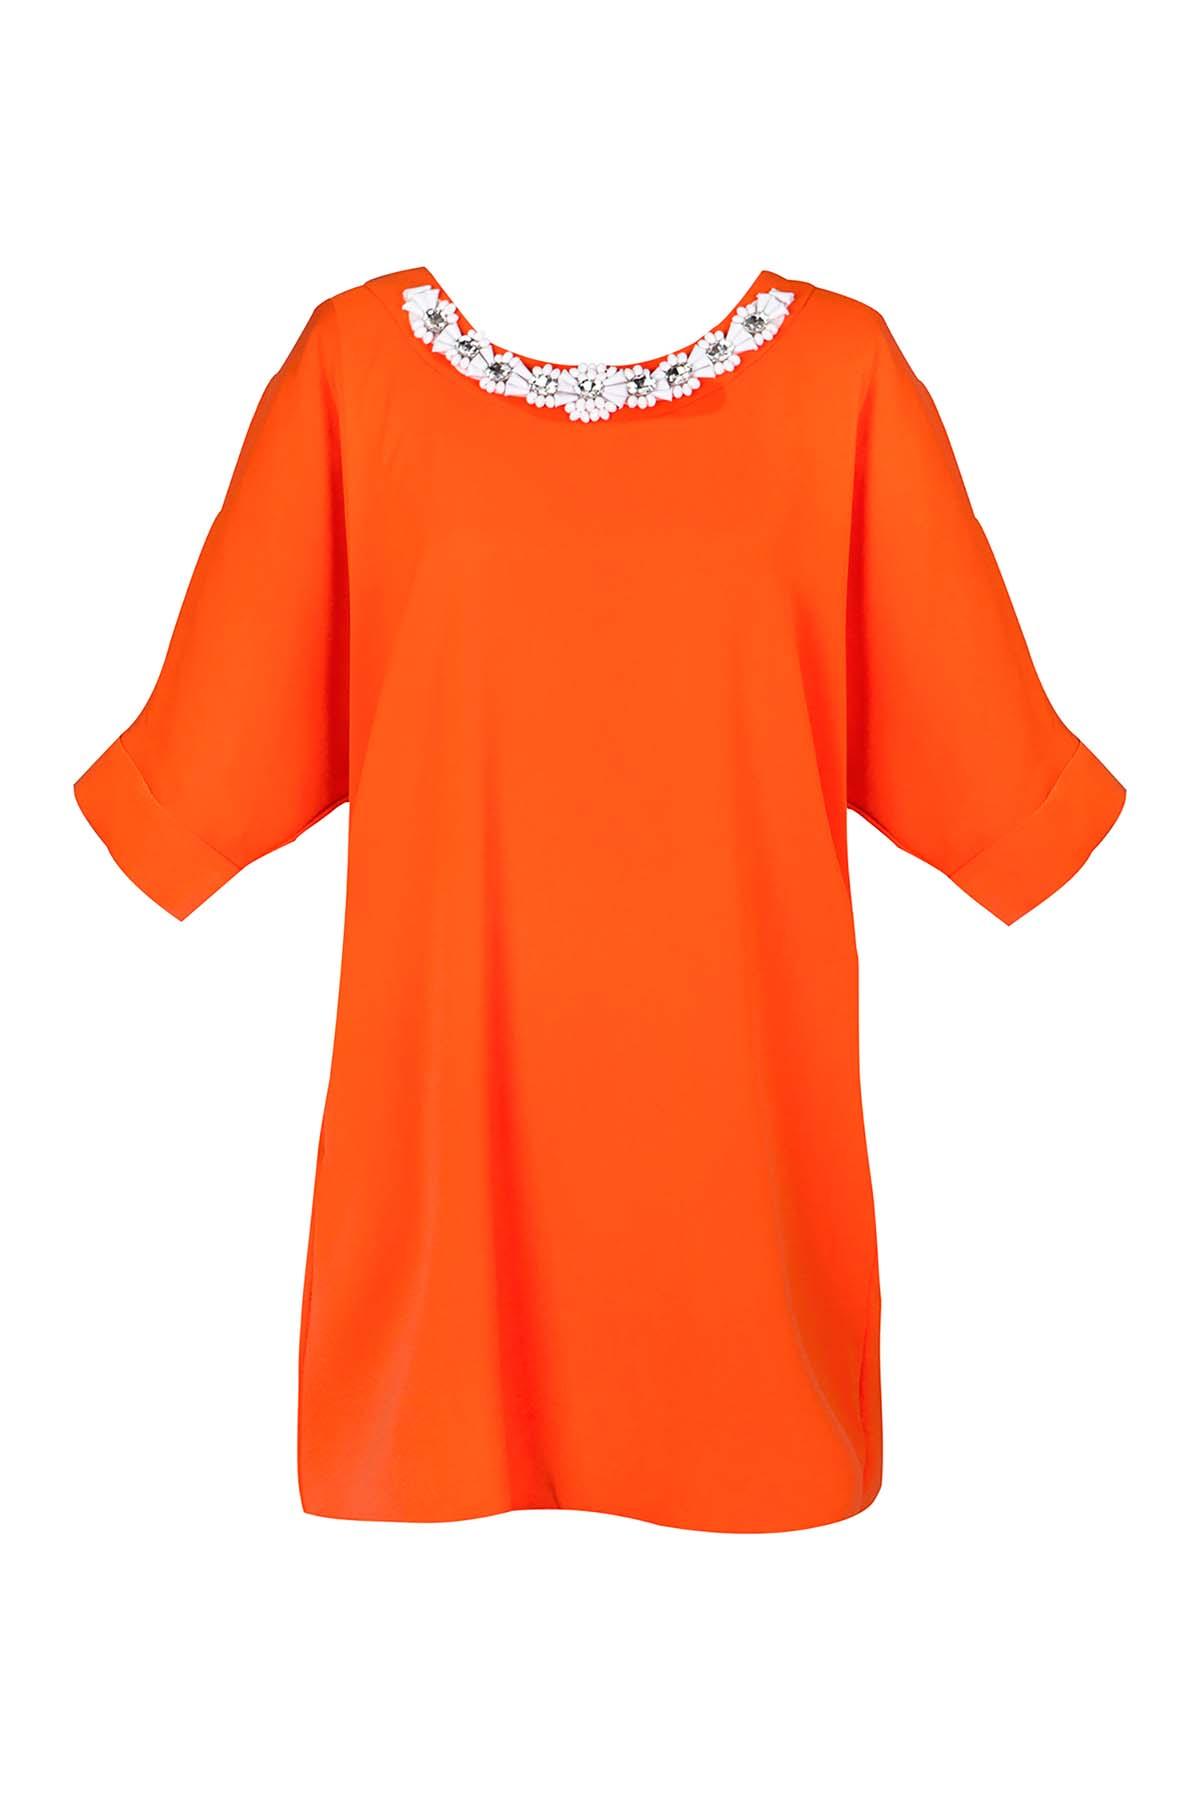 Teria Yabar - Vestido túnica naranja